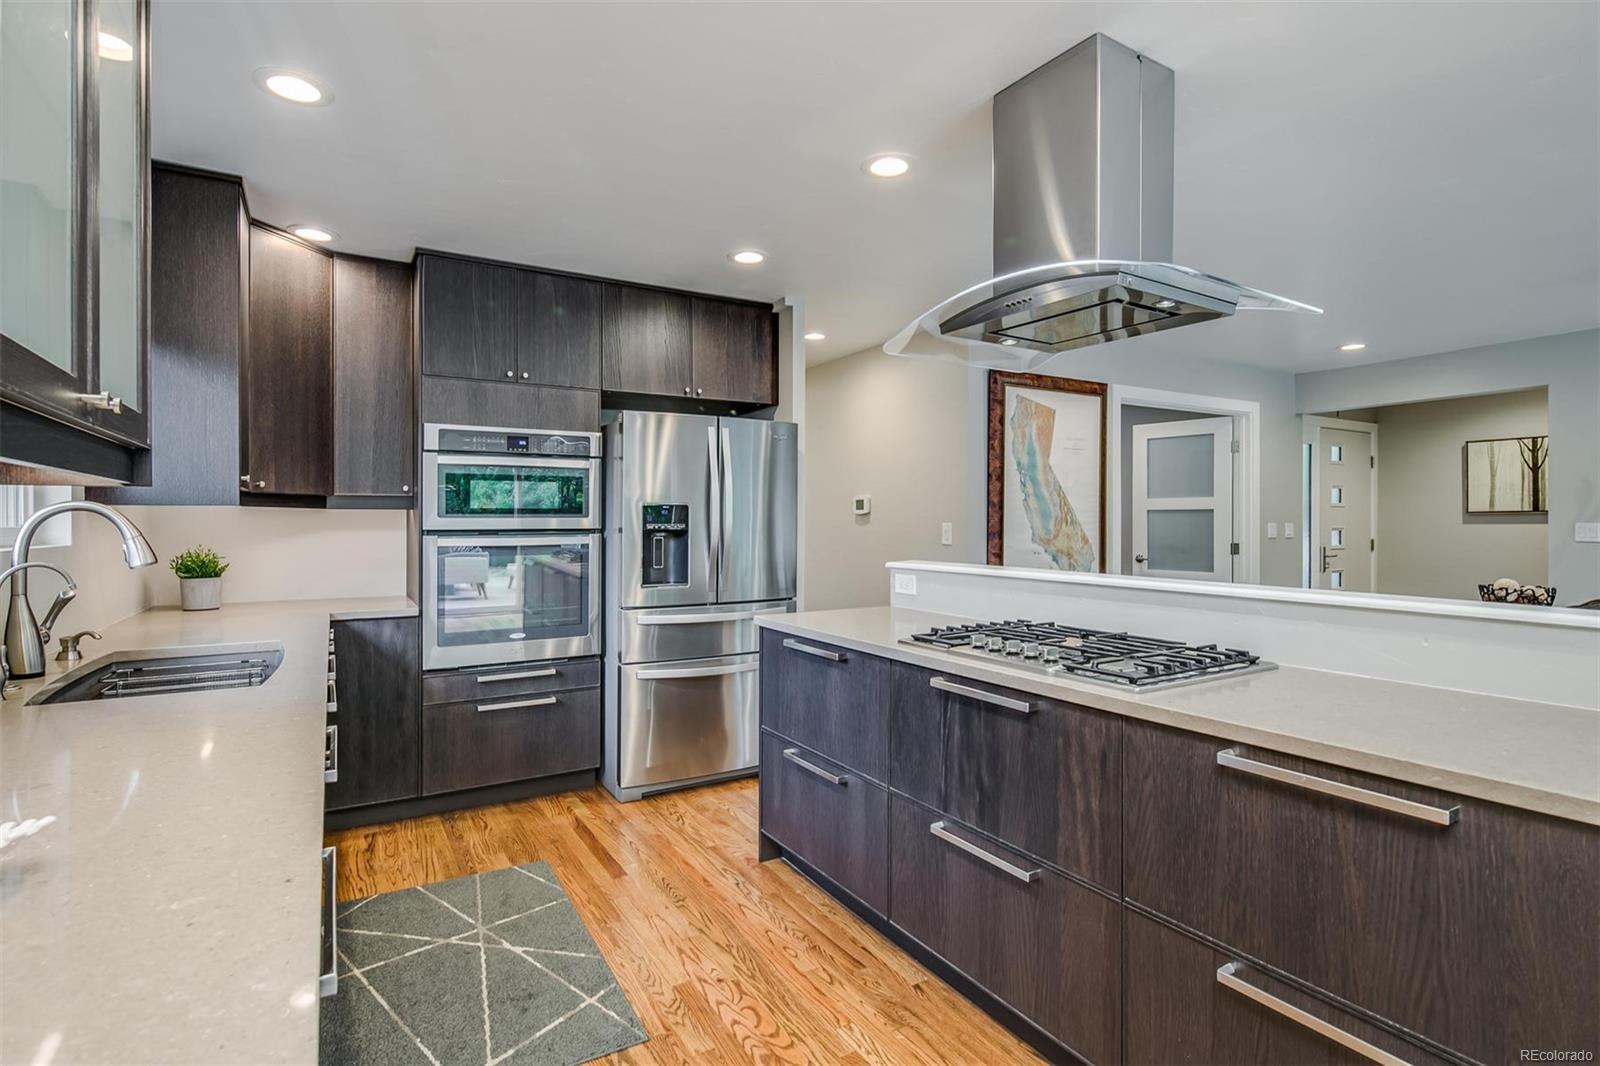 MLS# 9731177 - 1 - 1577  S Fairfax Street, Denver, CO 80222